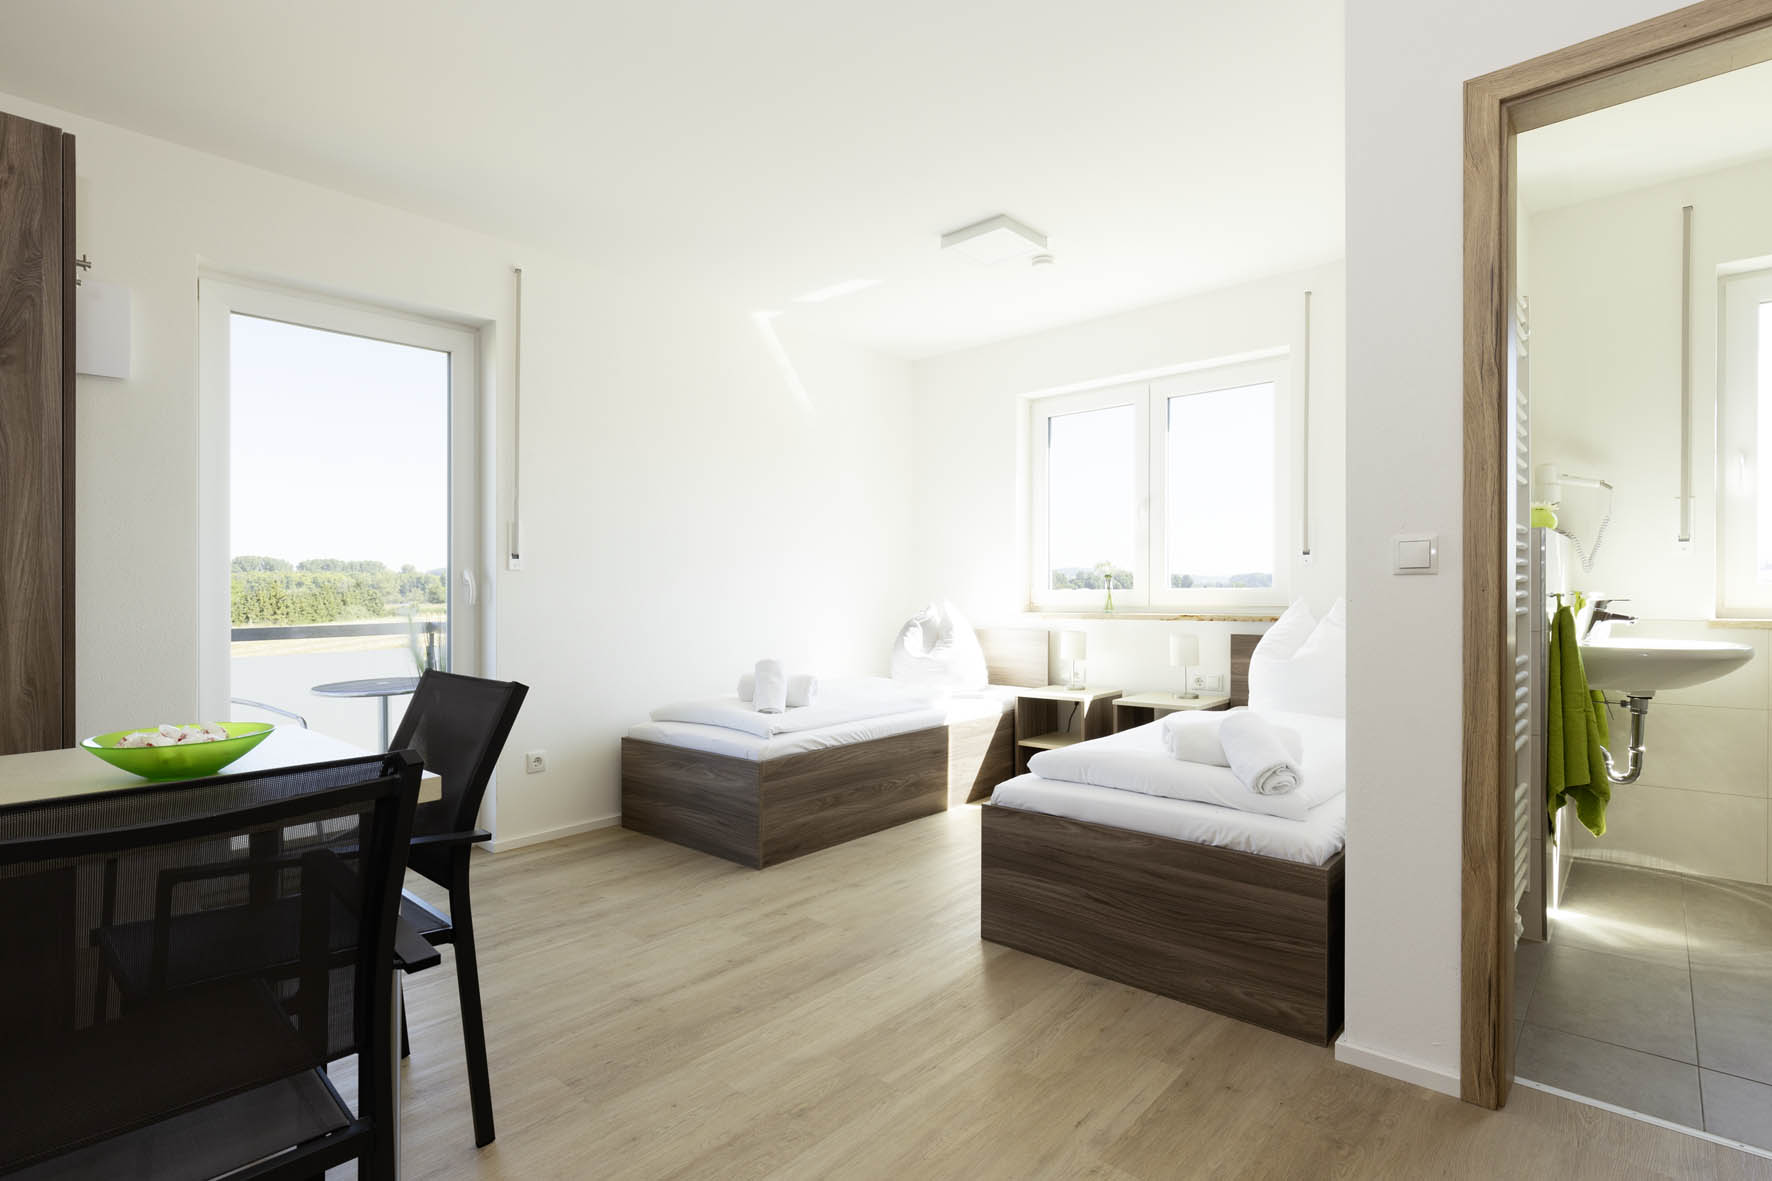 Zimmer mit Balkon - Green Guest House